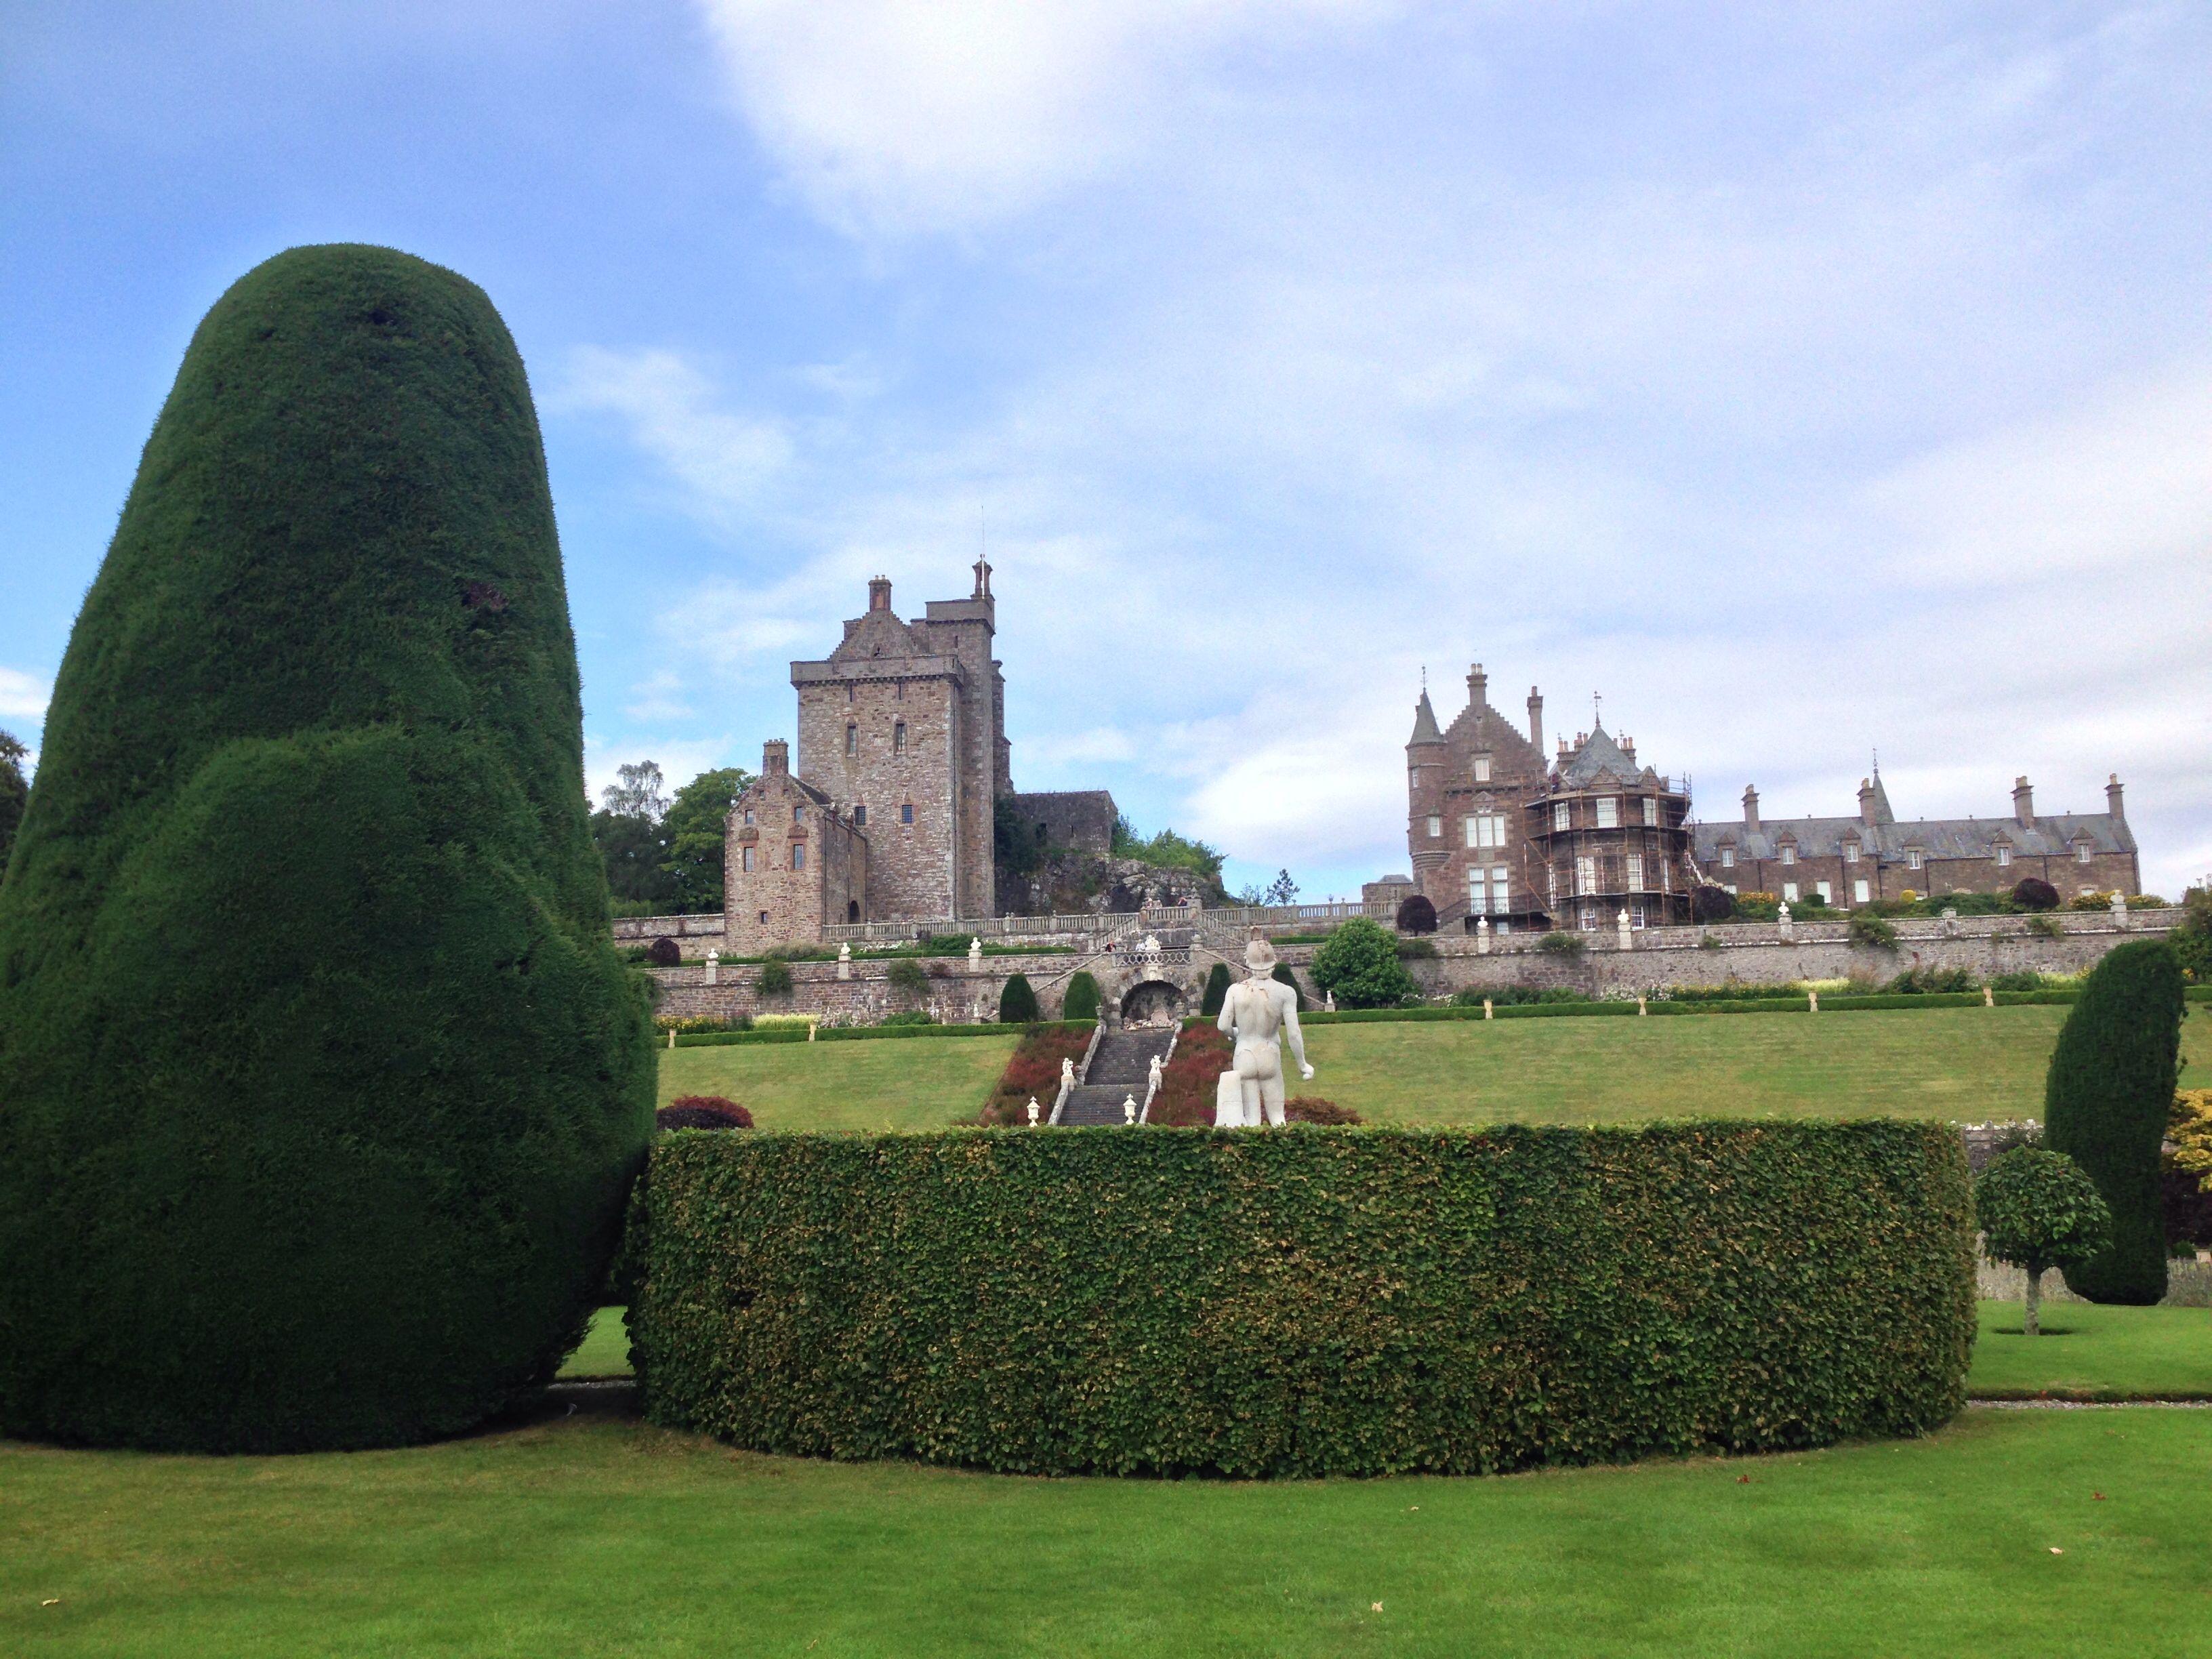 Drummond Castle